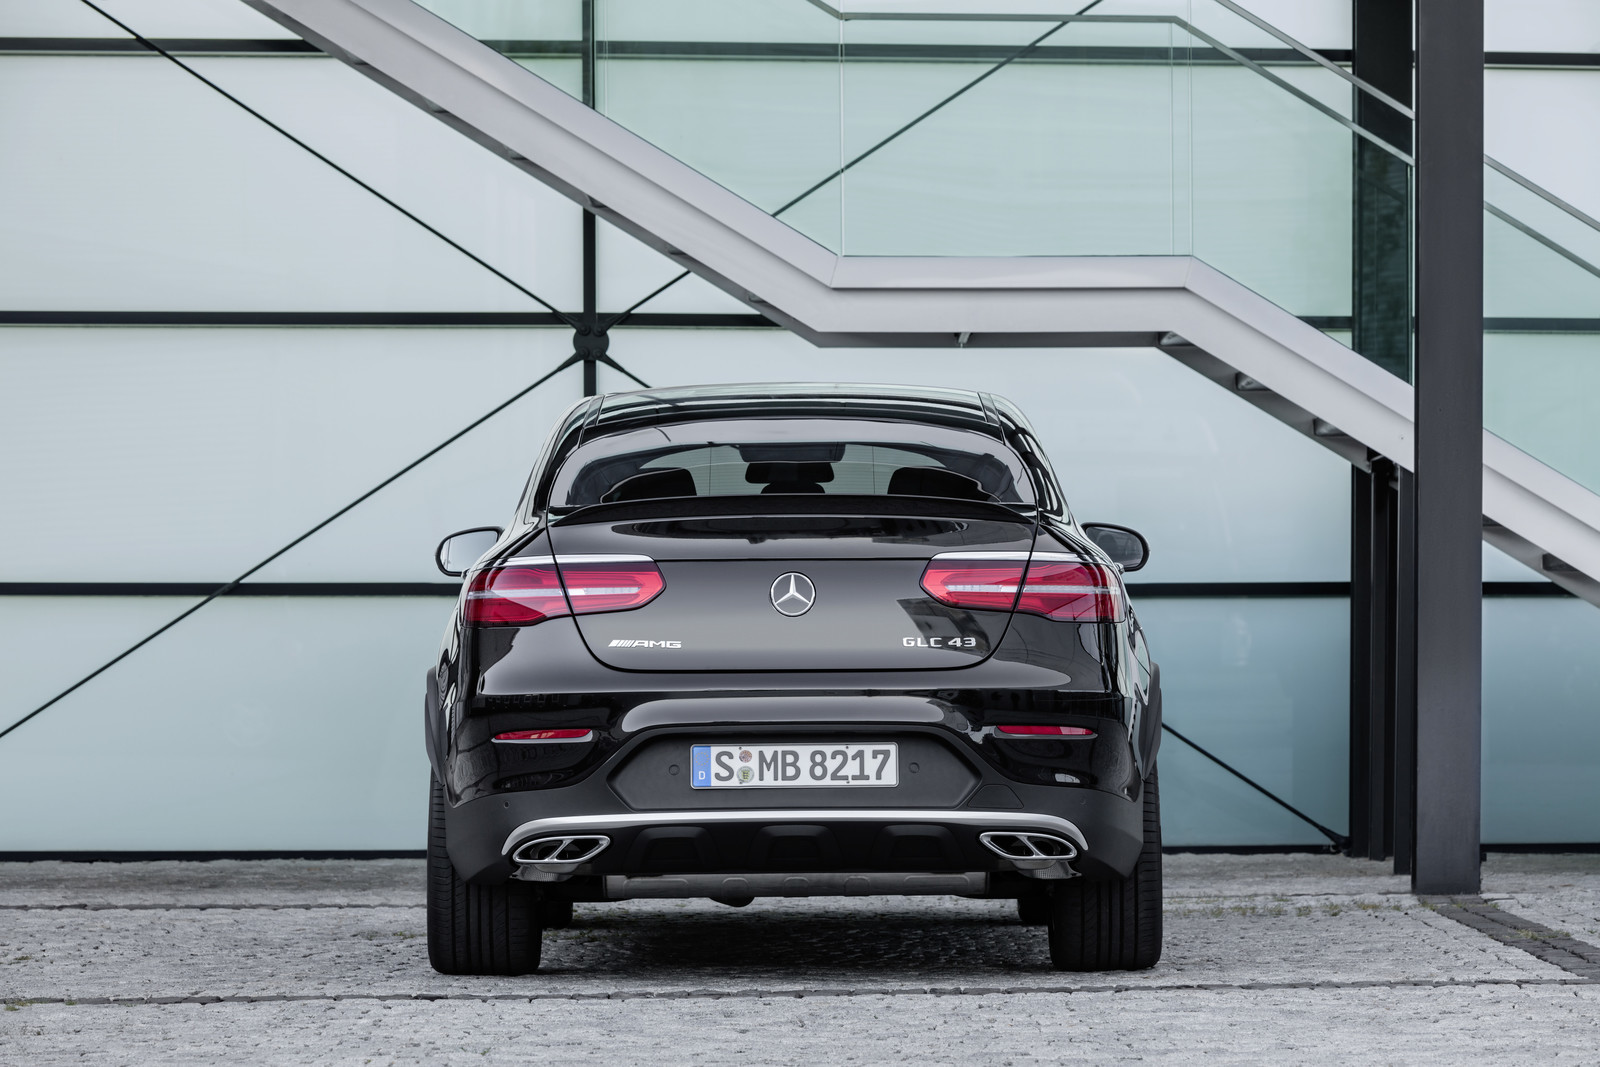 Foto de Mercedes-AMG GLC 43 4MATIC Coupé (13/24)